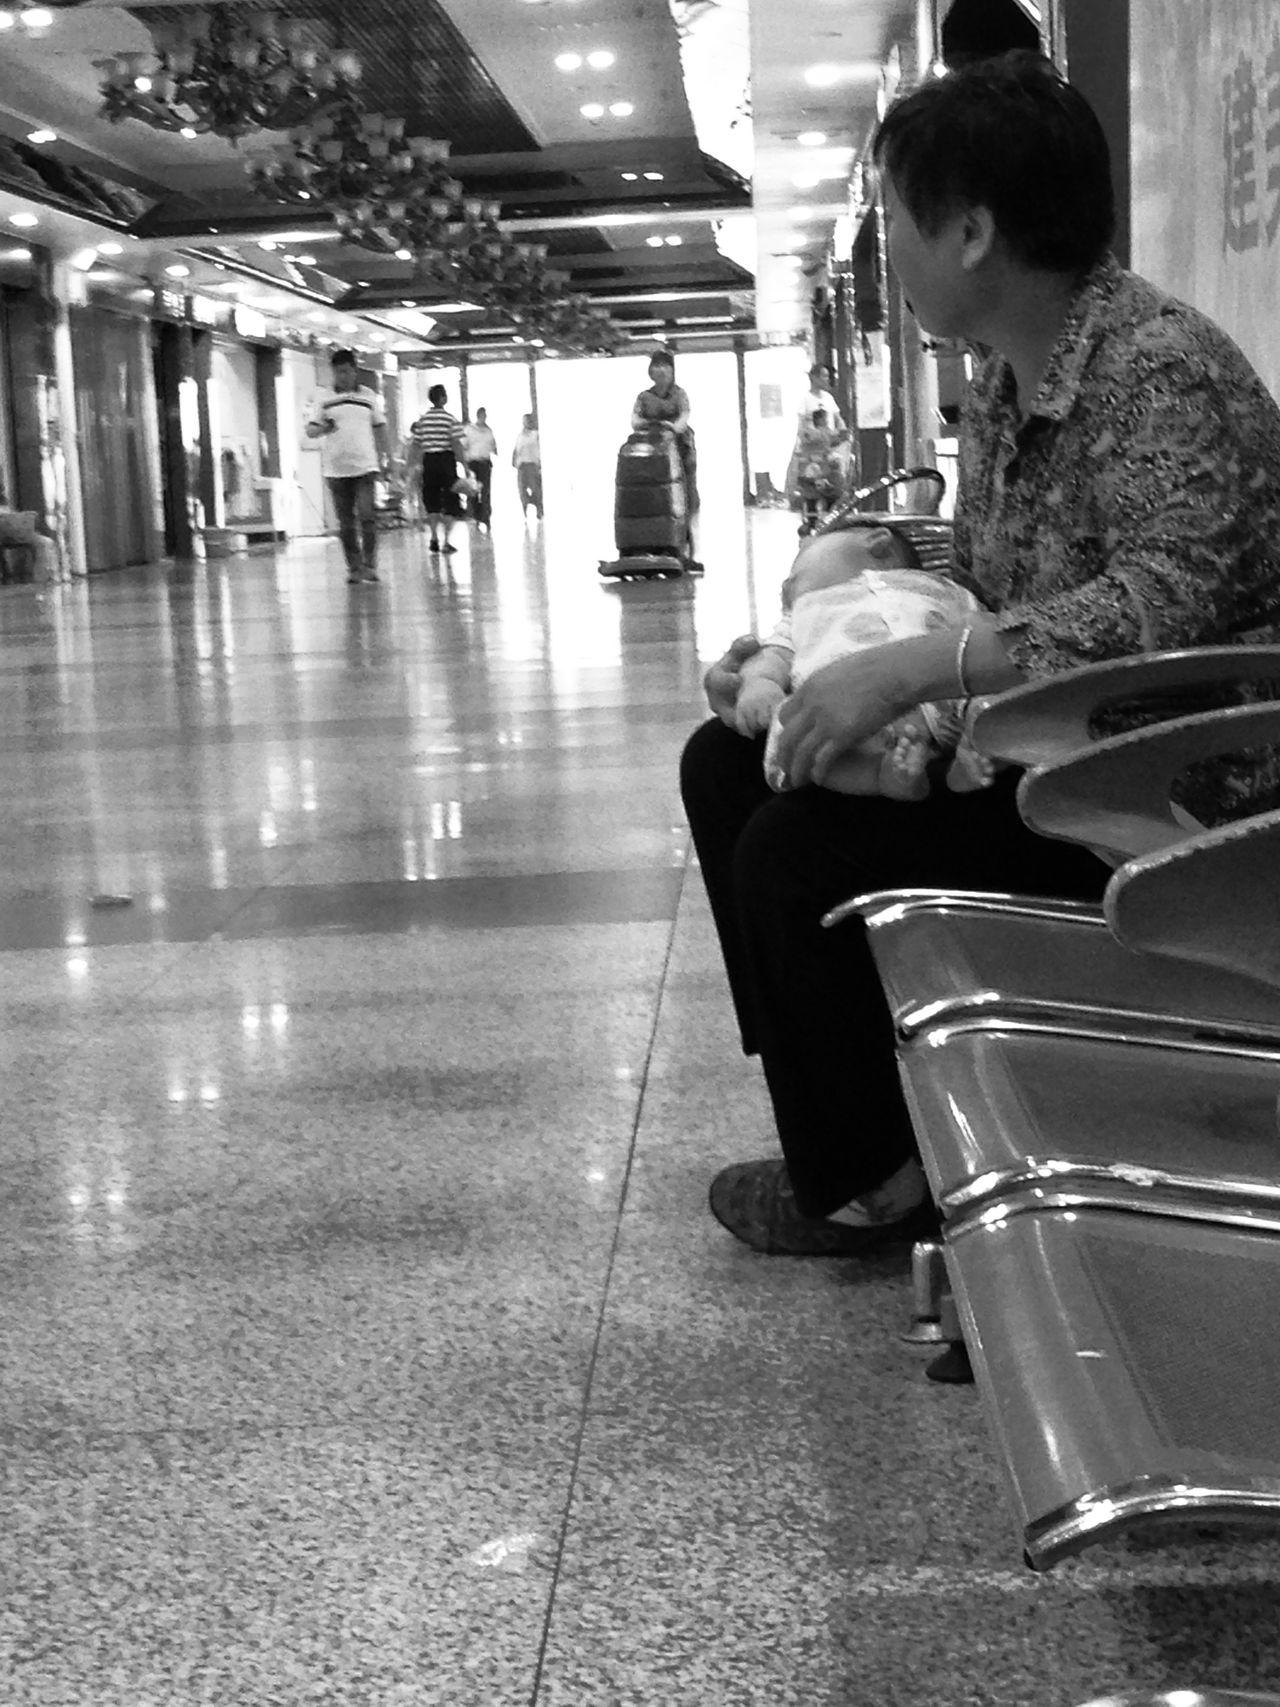 Babies China Naps Urinating Urinating In Public Waiting Women